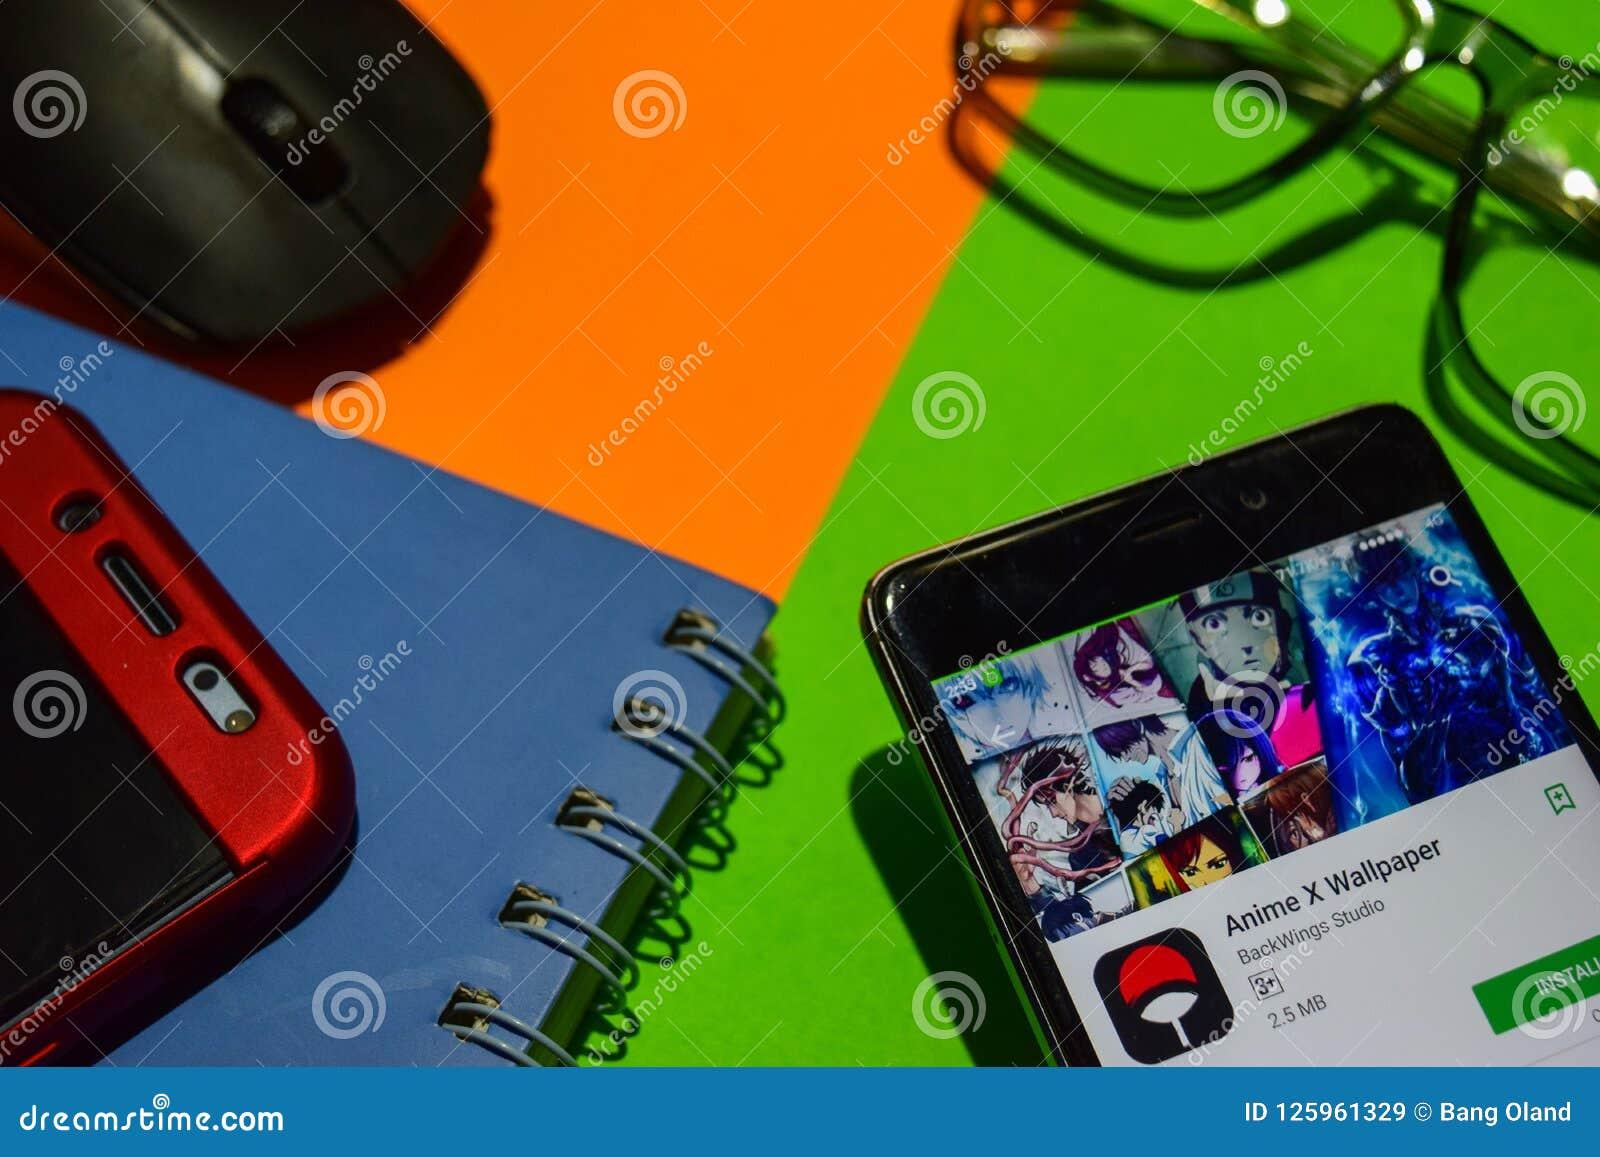 Anime X Wallpaper Dev App On Smartphone Screen Editorial